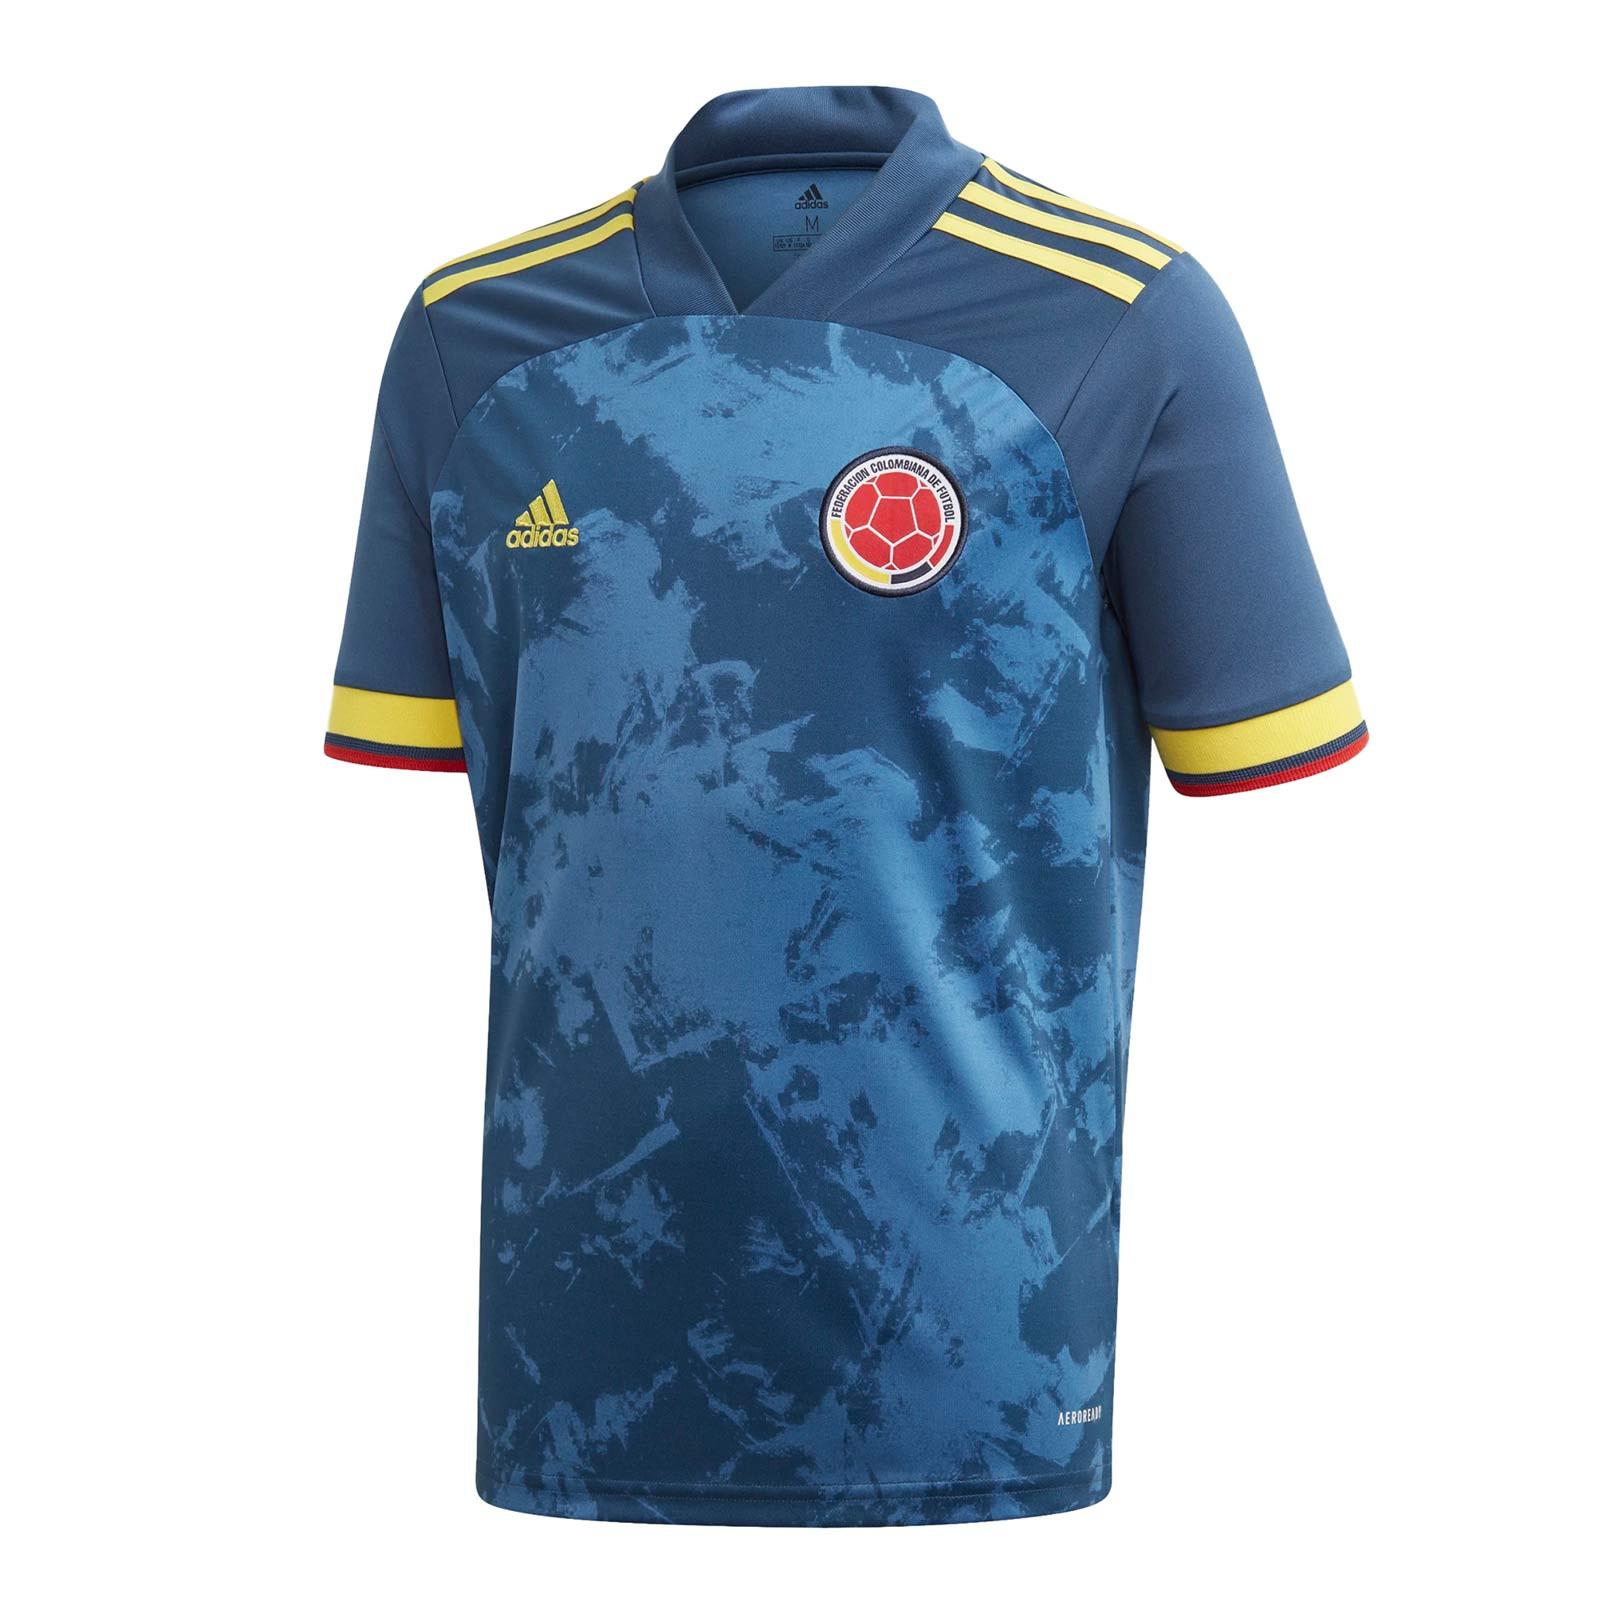 Teleférico Residencia Cambiable  Camiseta niño adidas 2a Colombia 2020 2021 | futbolmaniaKids